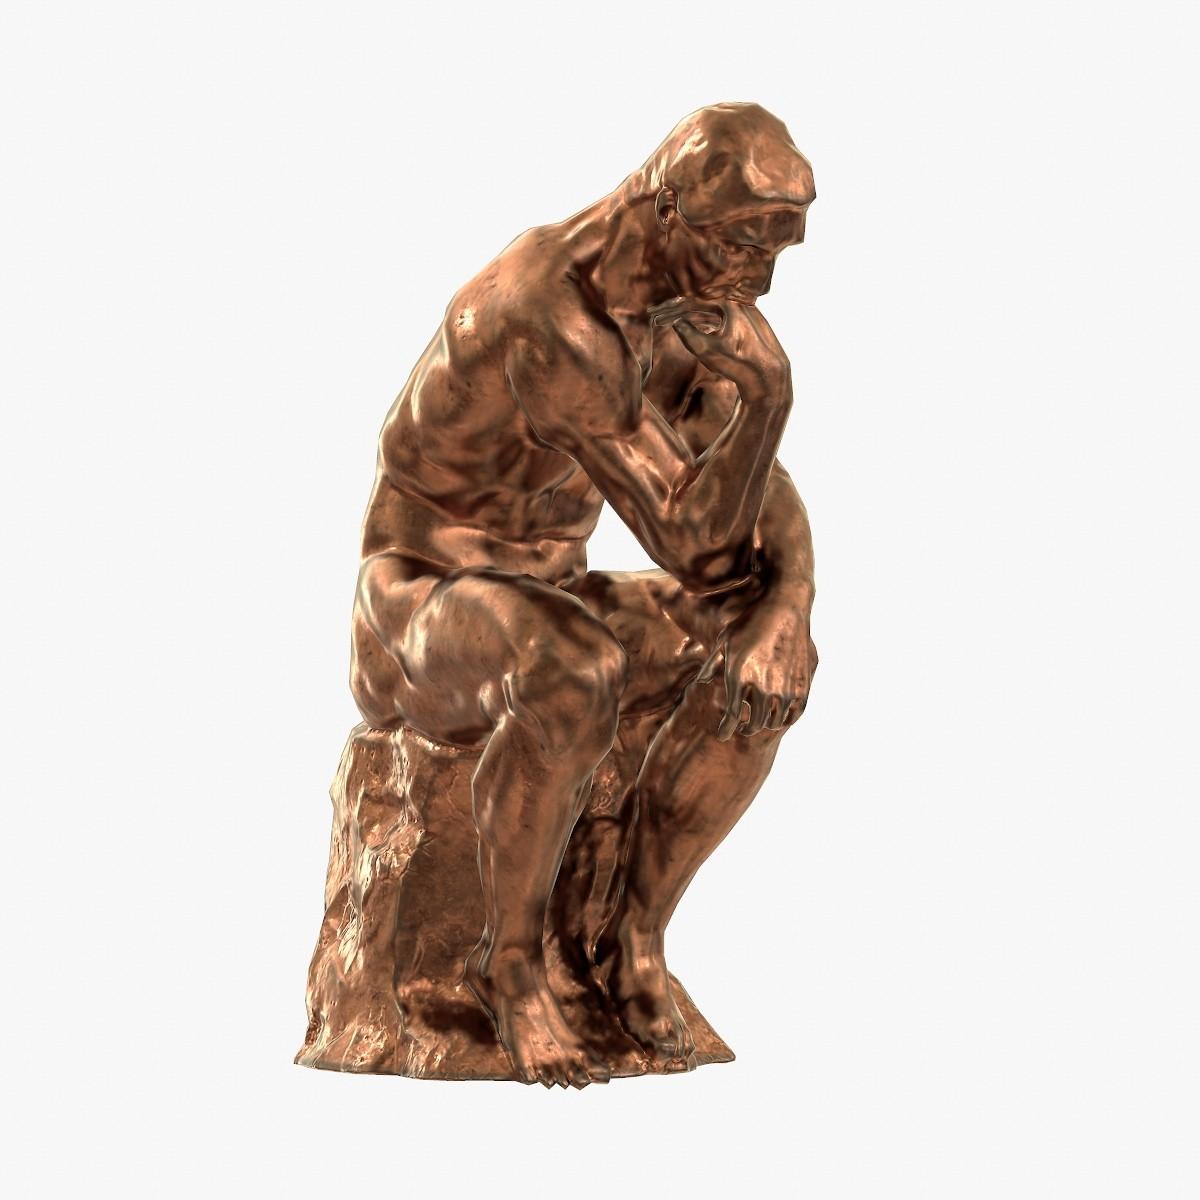 3d reproduced sculpture thinker